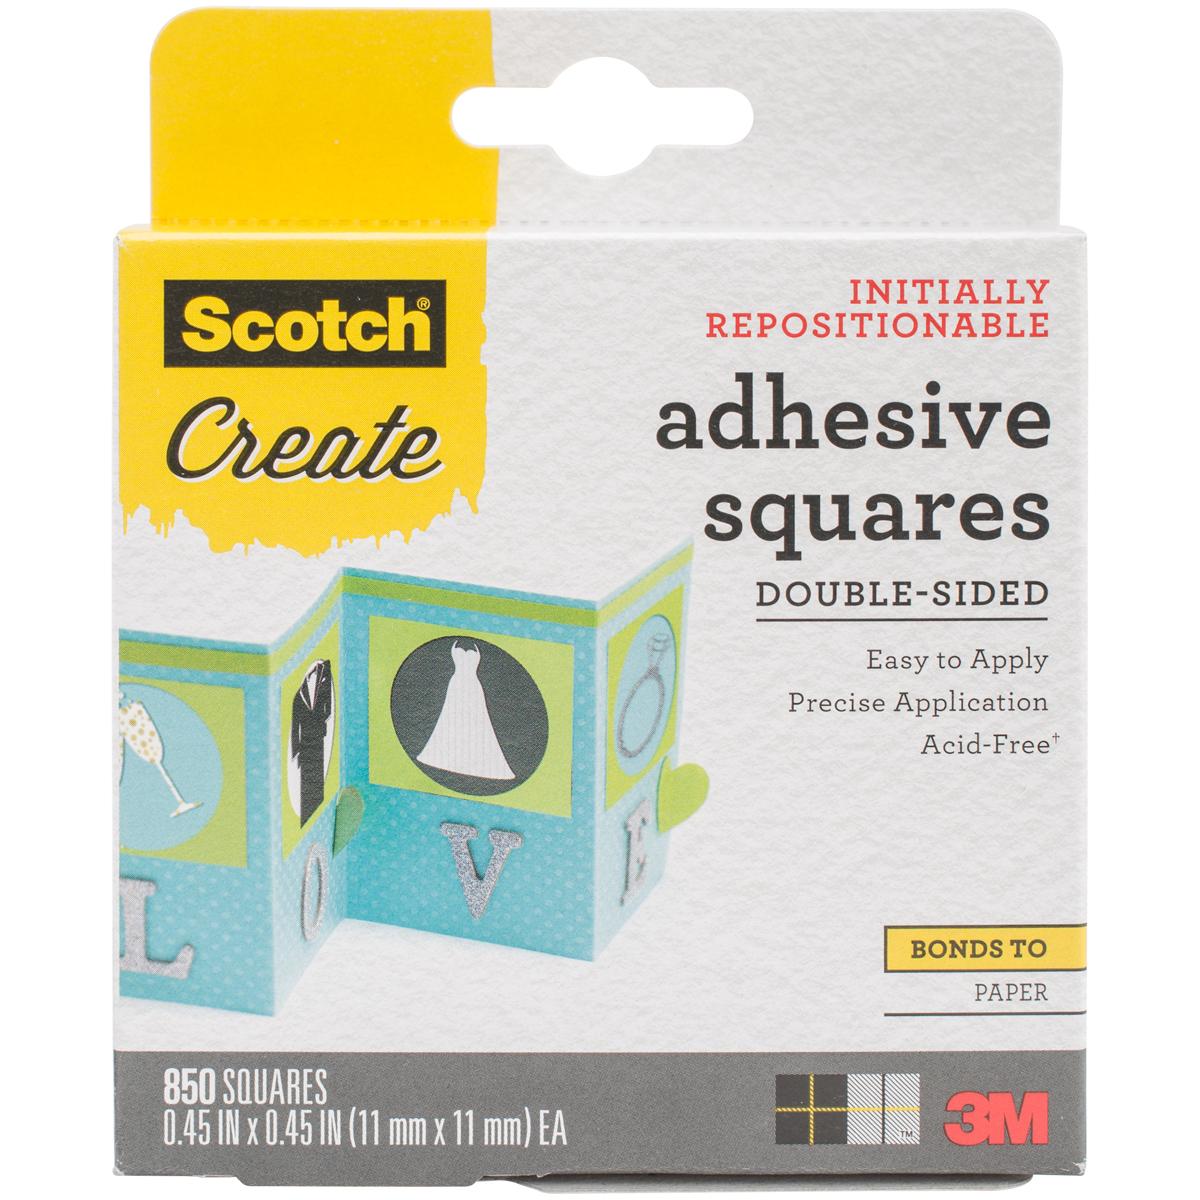 Scotch Adhesive Sq.